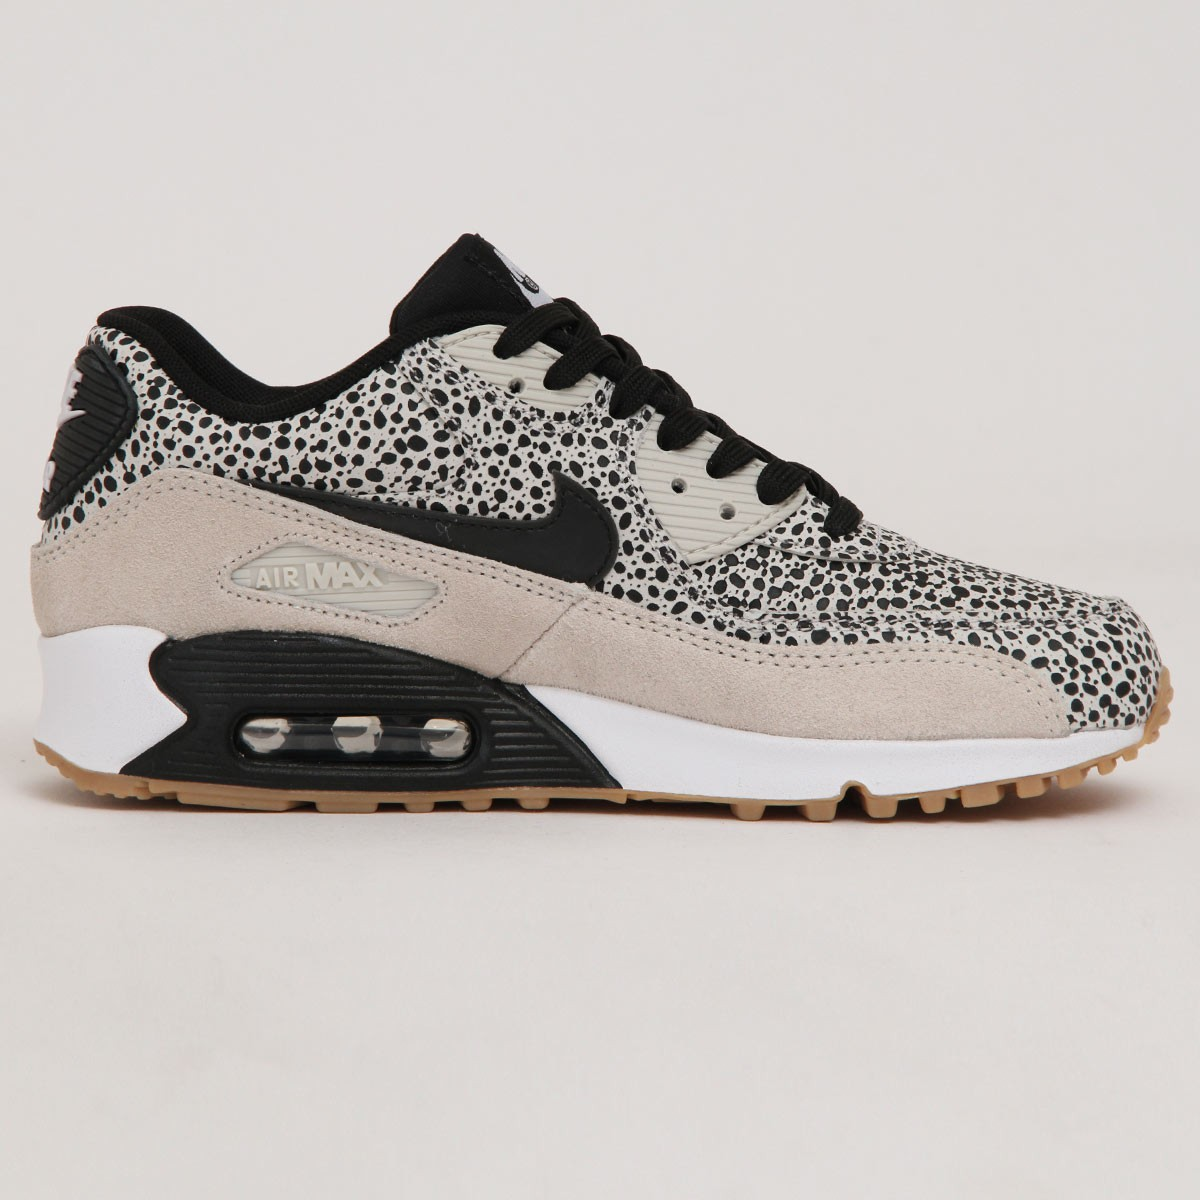 443817-102 Wmns Air Max 90 Prm női utcai cipő 2f265b2e91